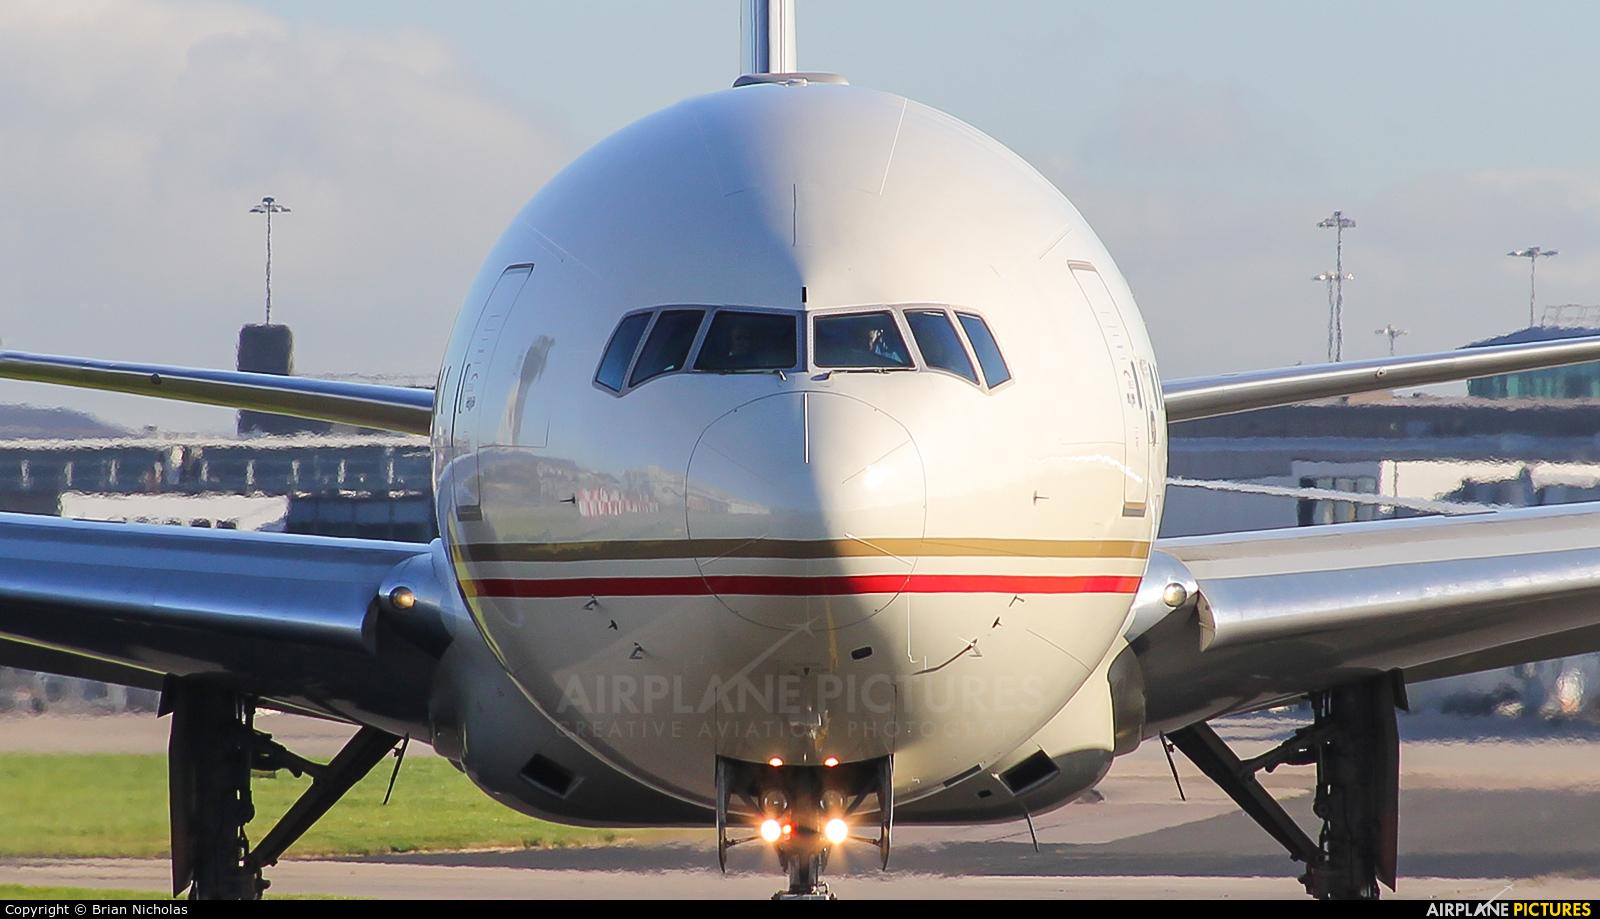 Etihad Airways A6-ETI aircraft at Manchester